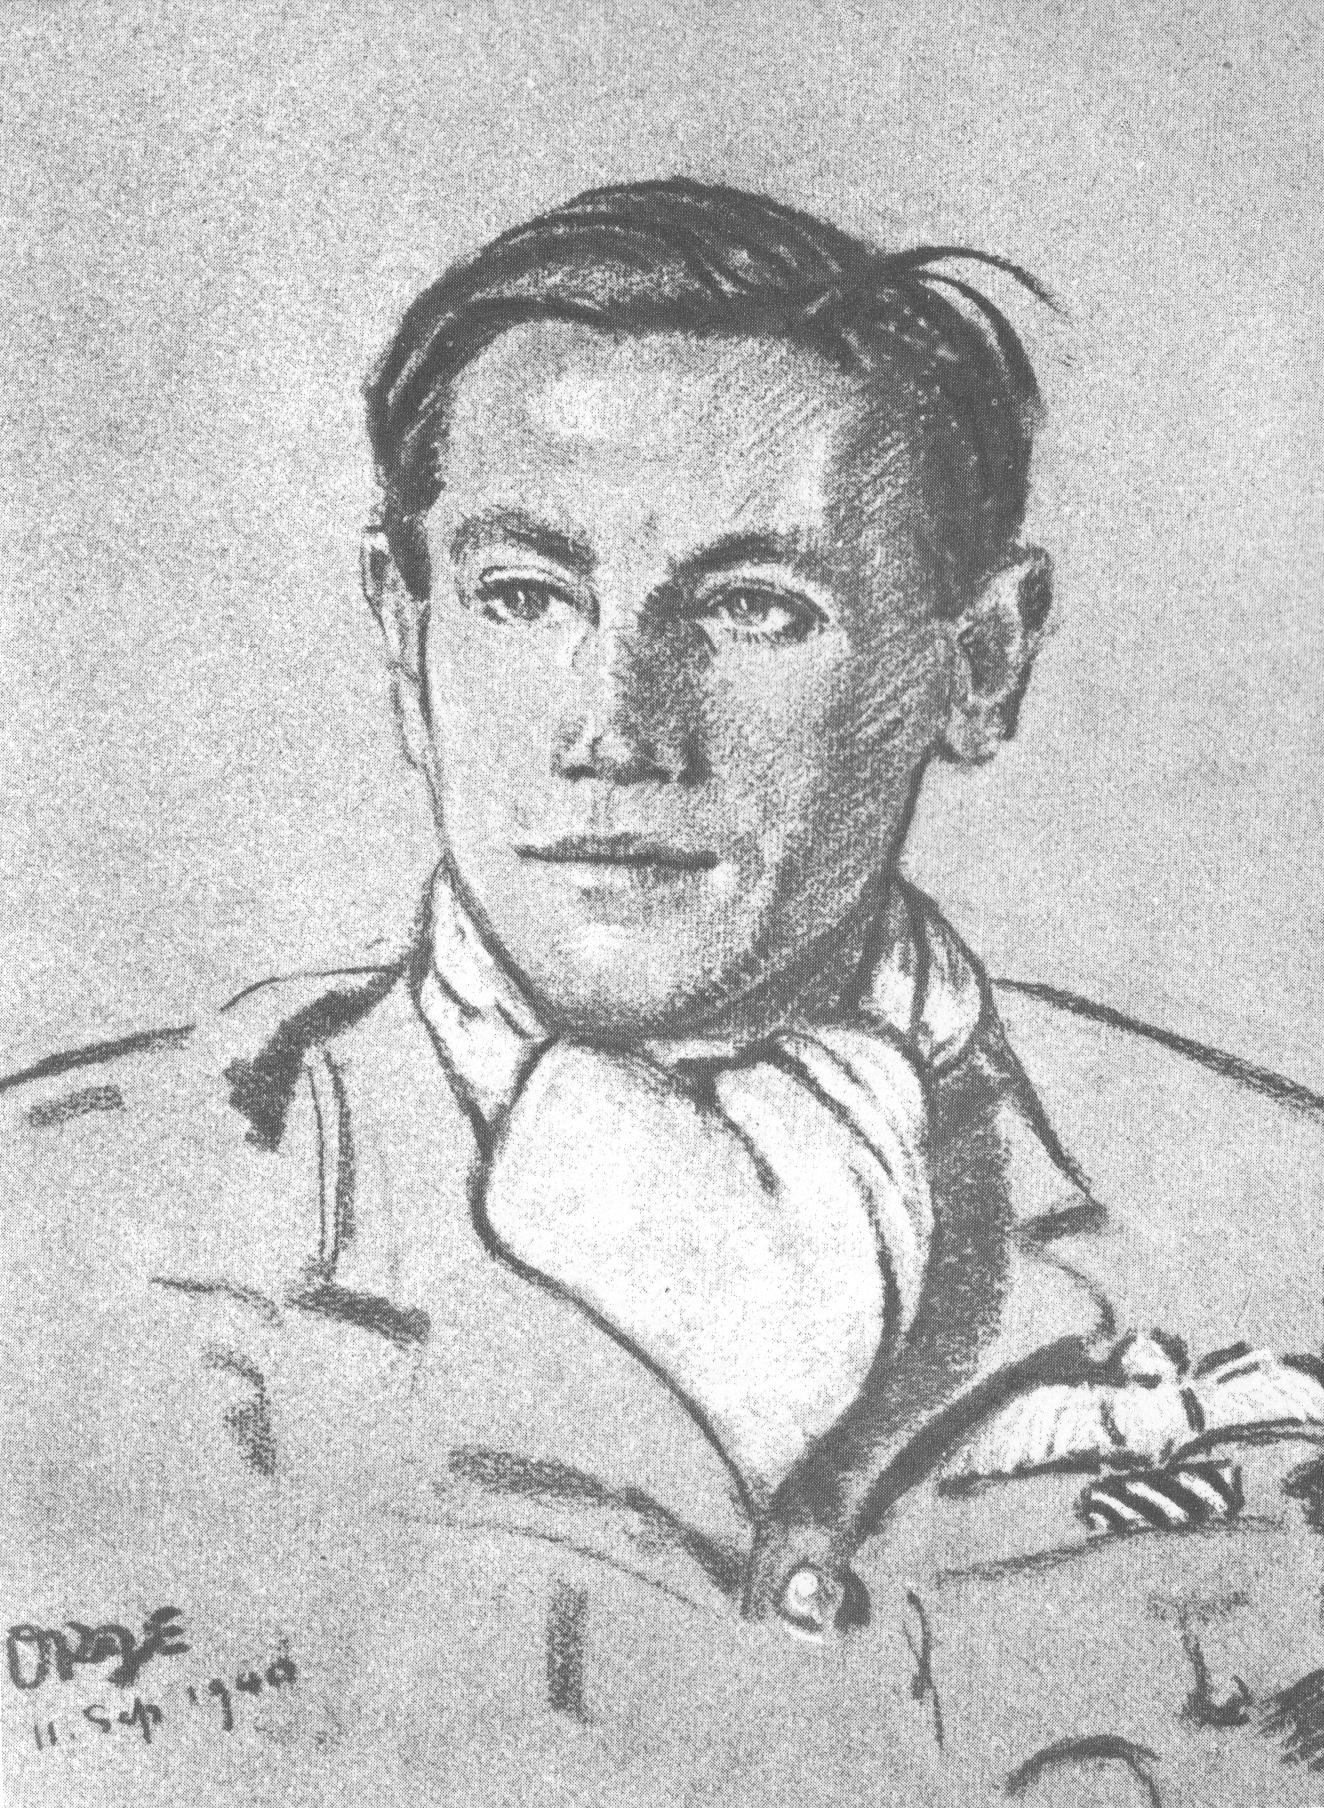 Harold bird wilson wikipedia